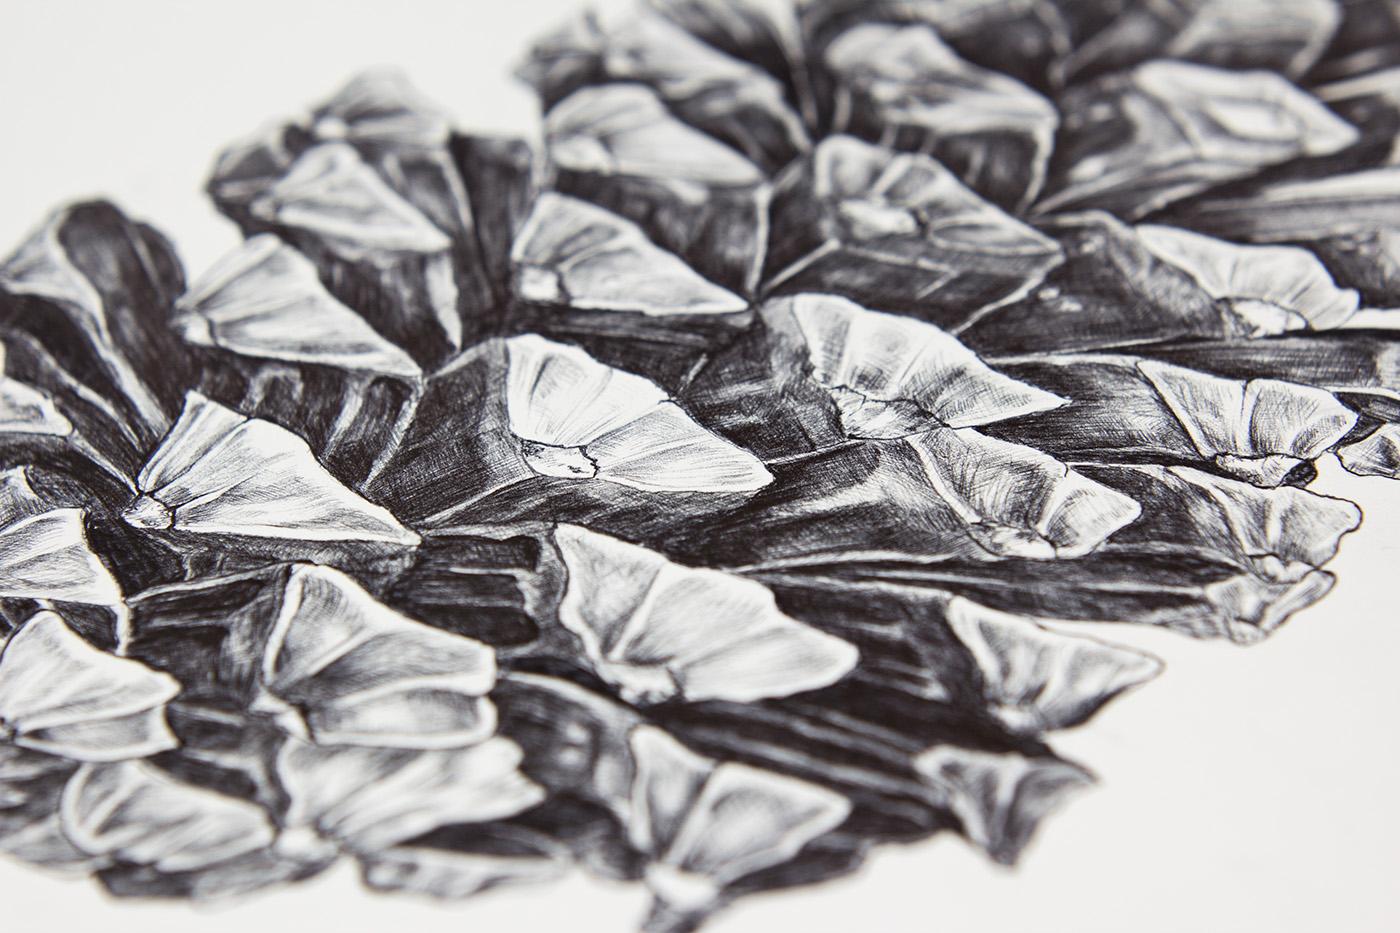 pine cone,ball pen,kookaburra,pine,fir cone